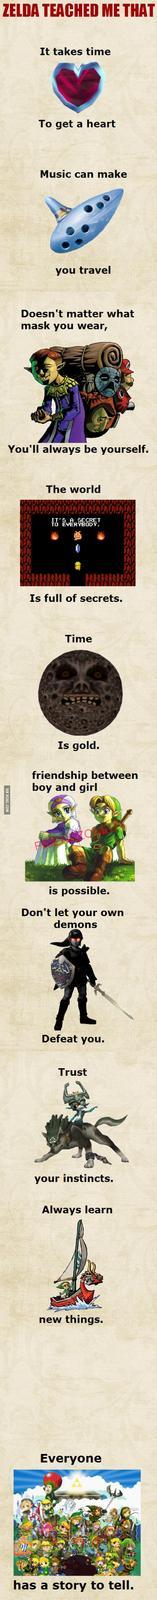 Zelda teached me that...